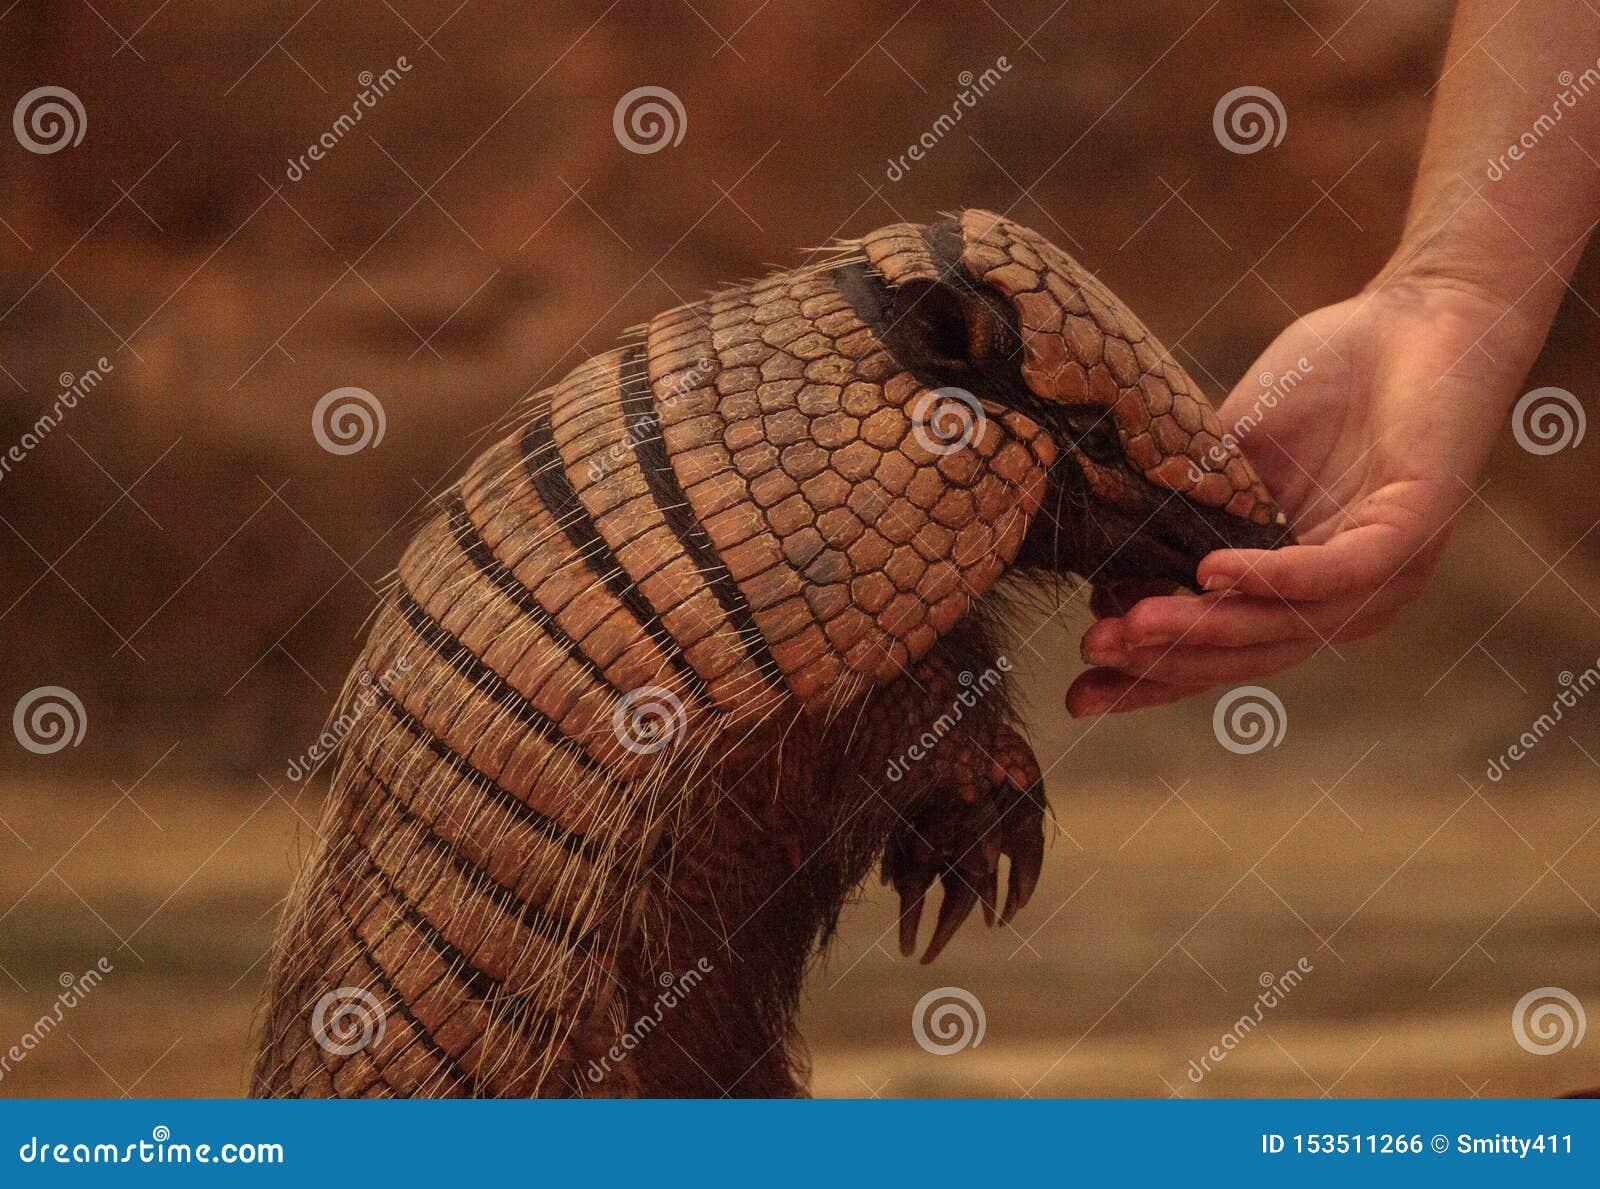 Nine-banded armadillo, Dasypus novemcinctus